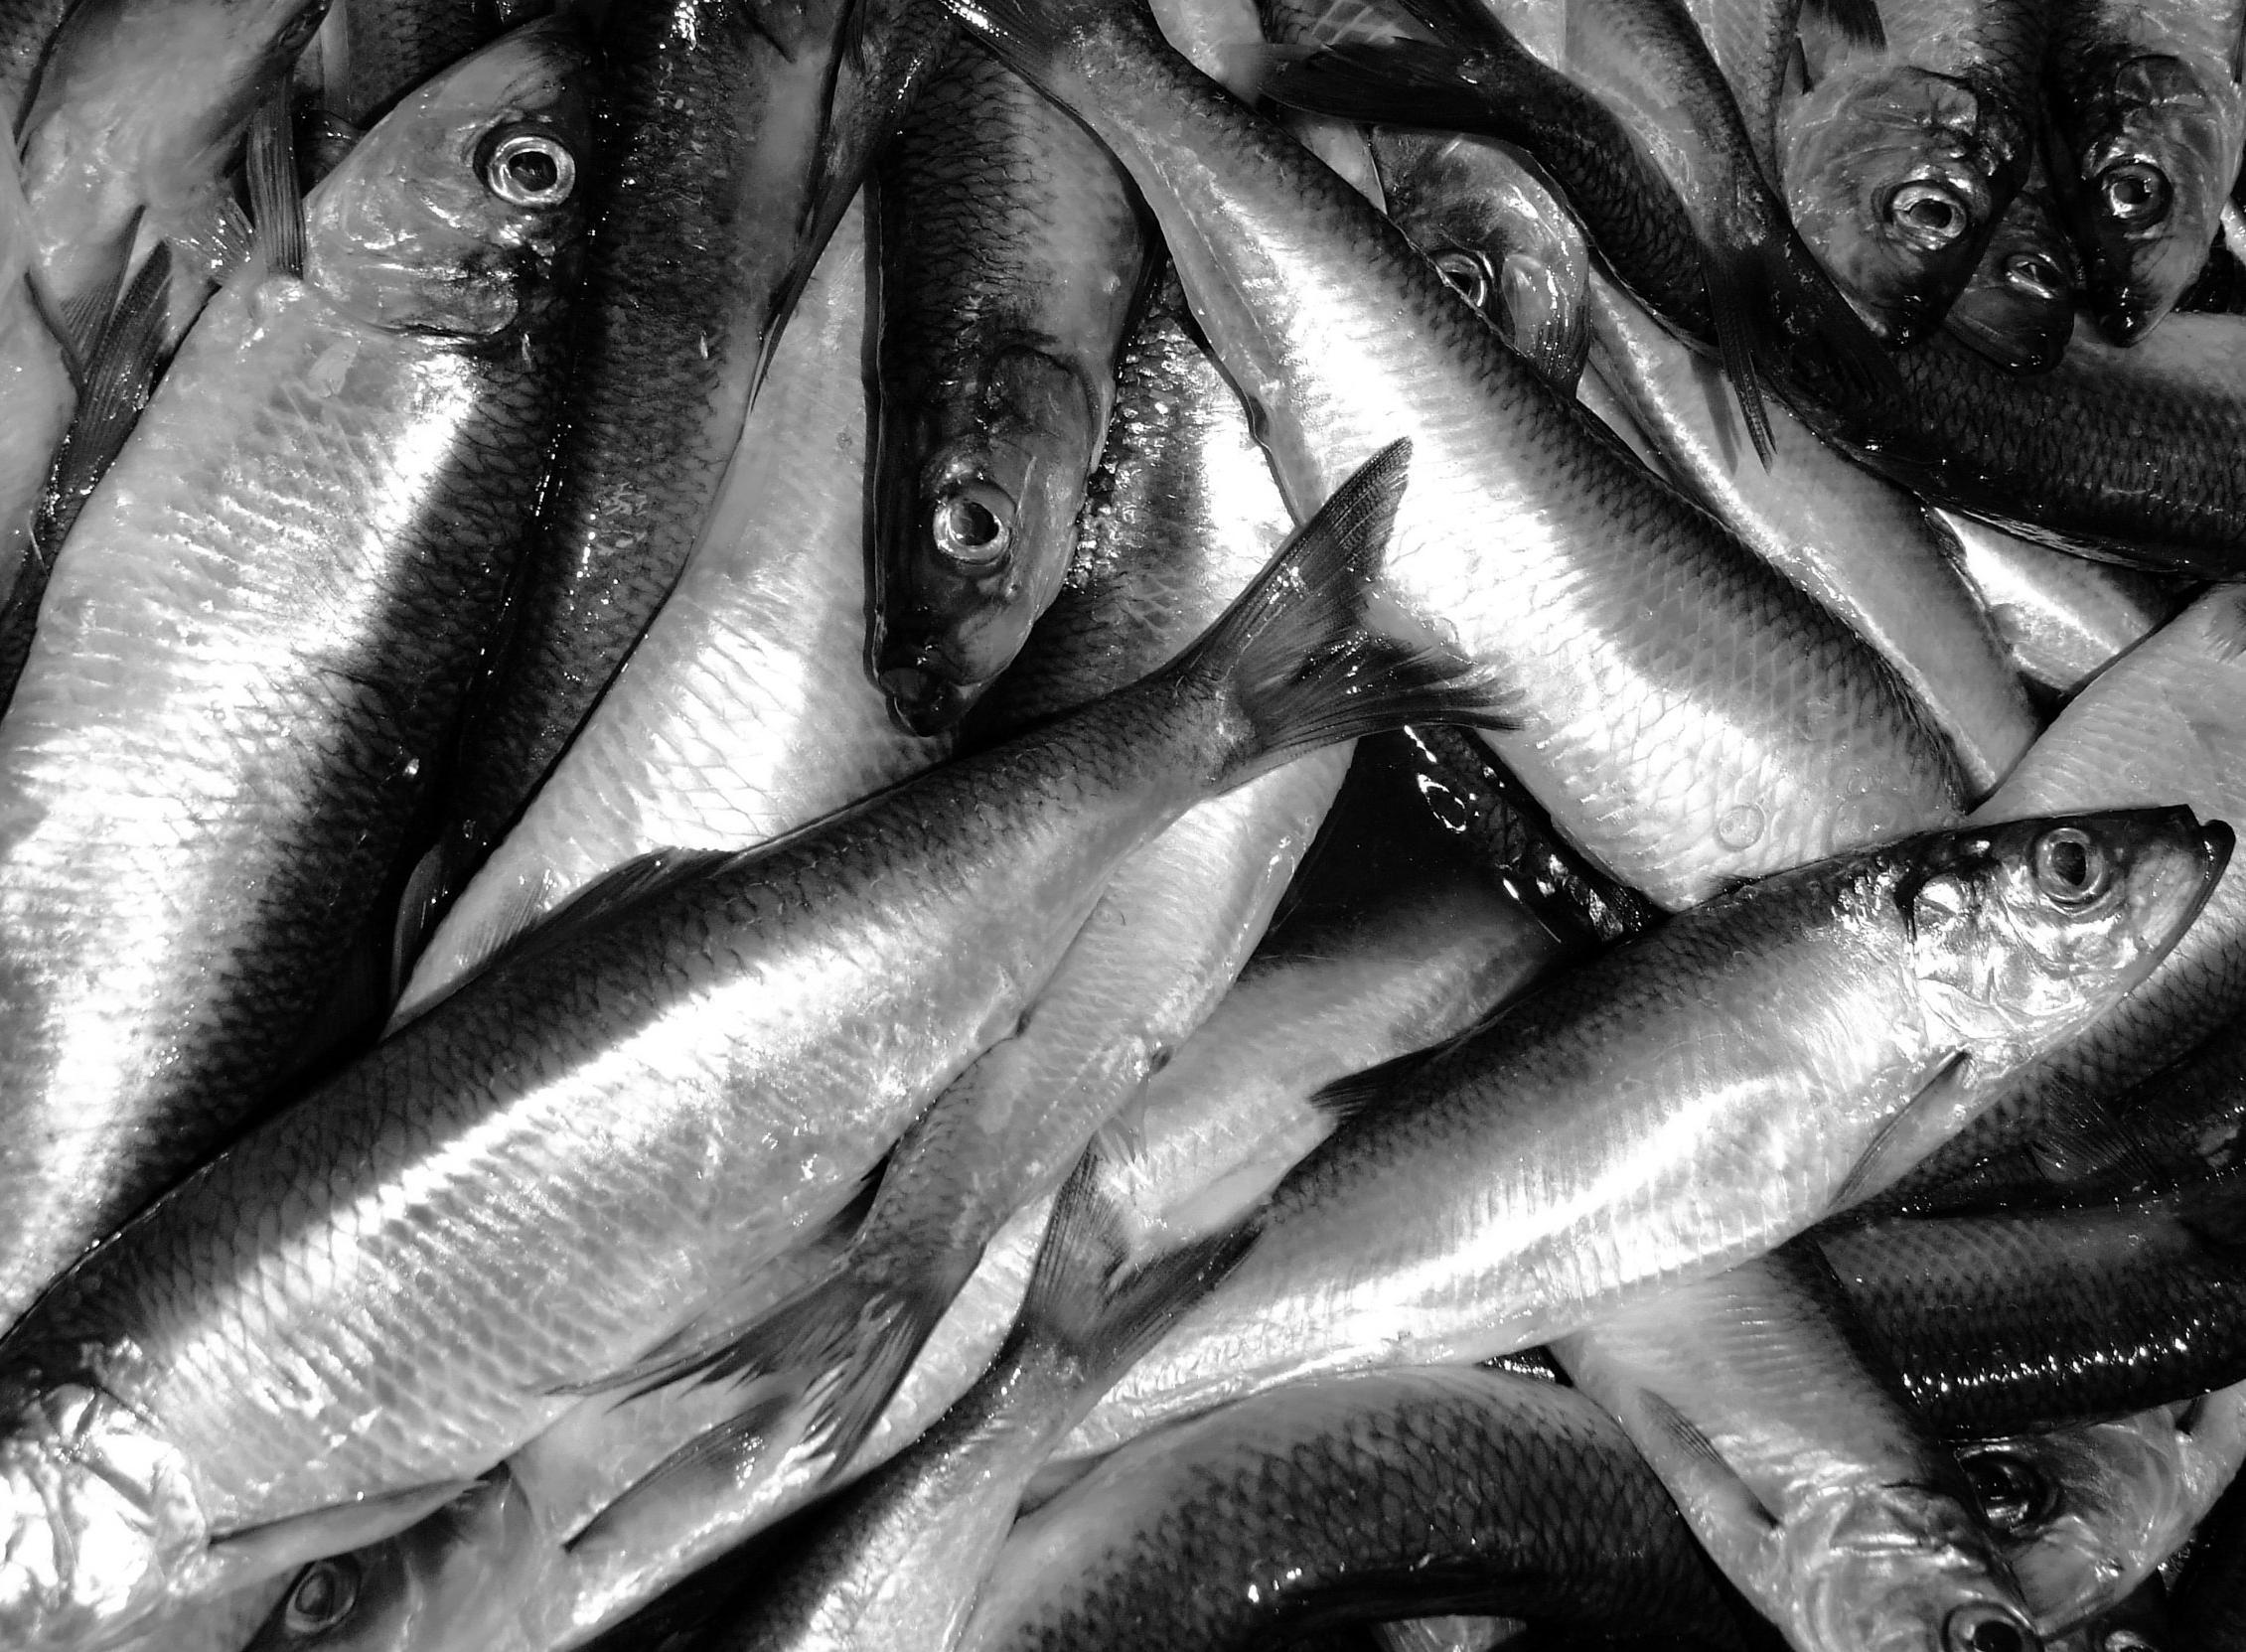 Scotia Garden Seafood Bait